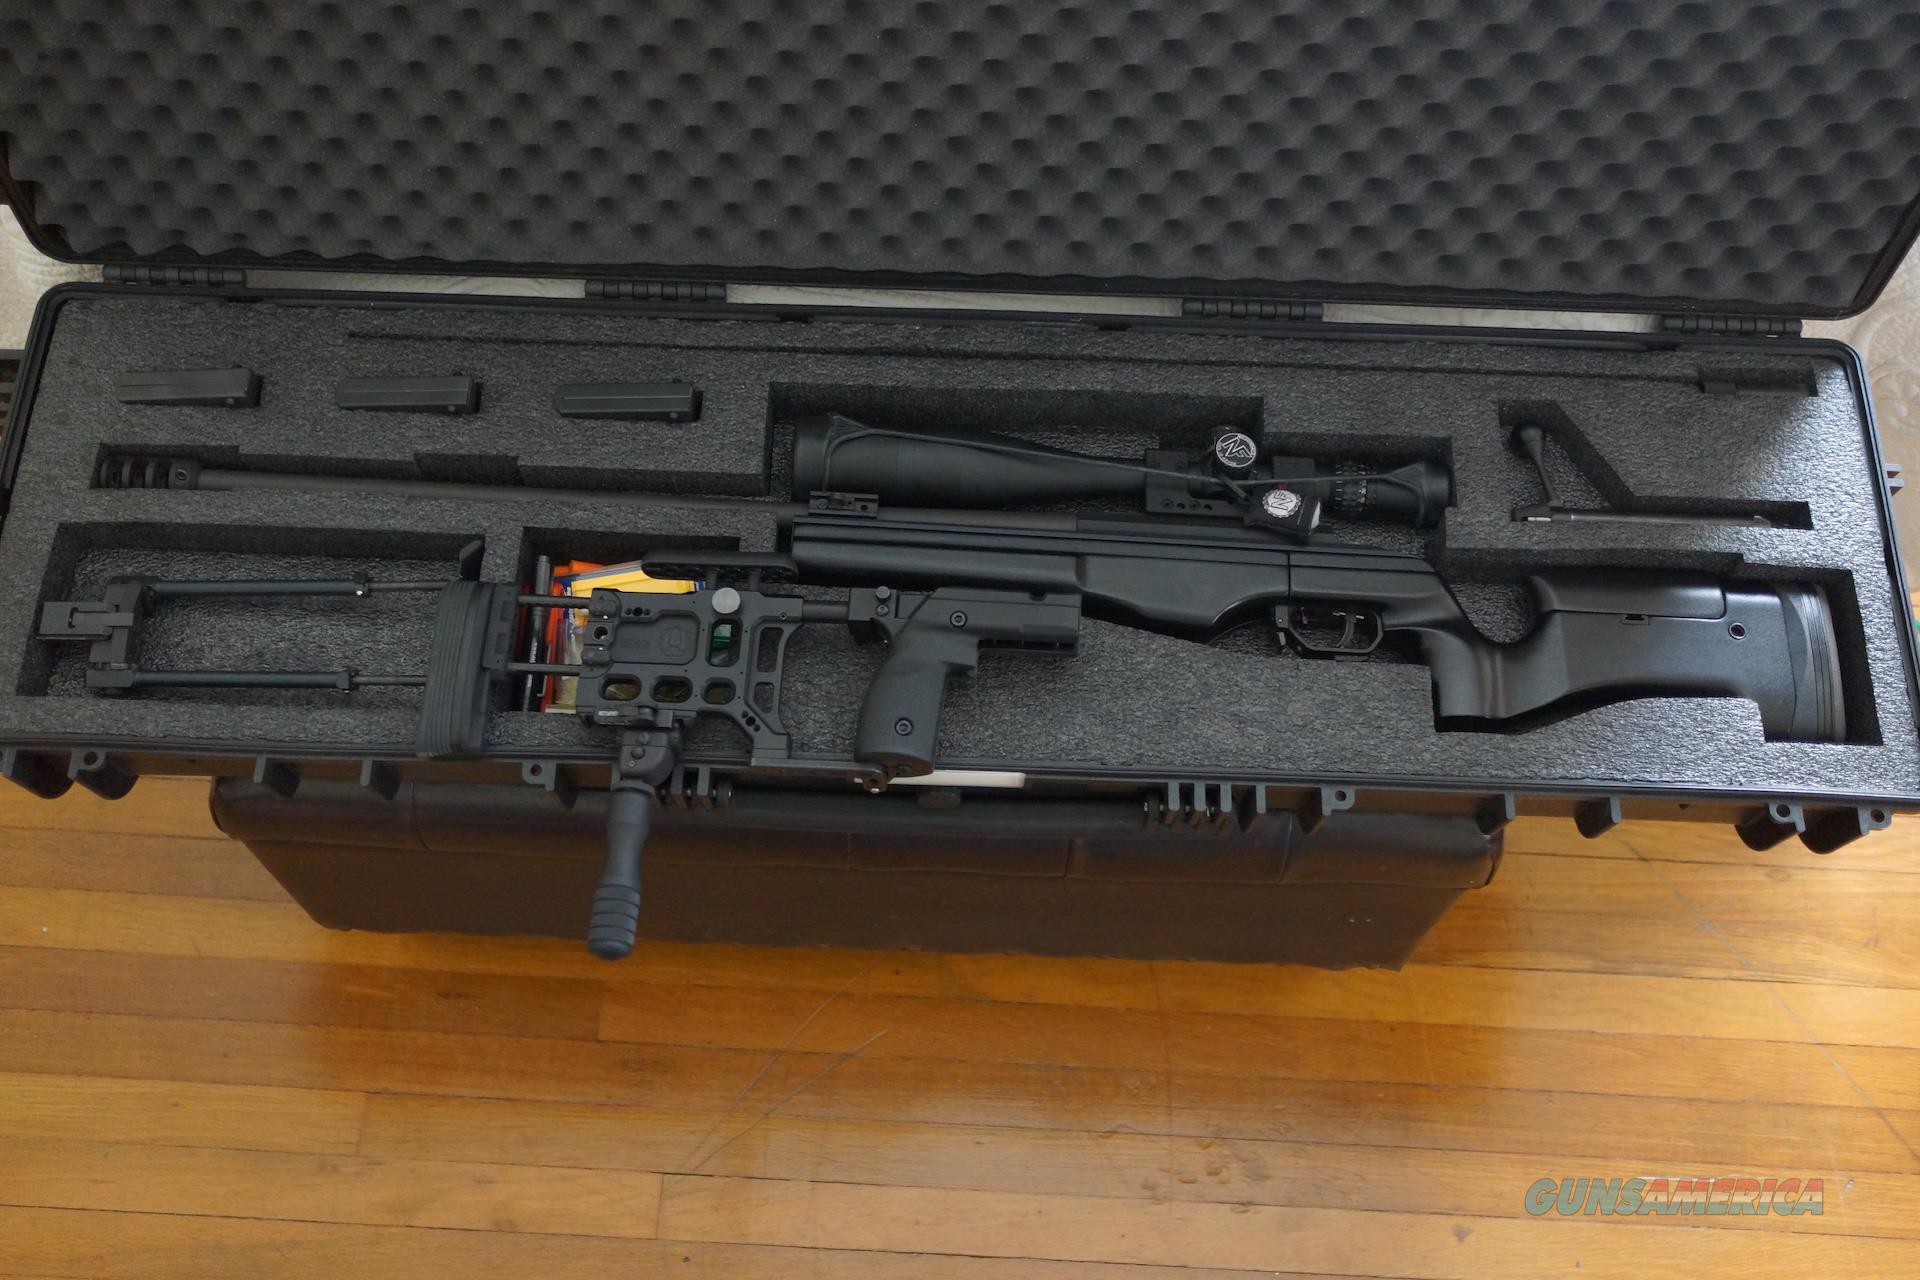 Sako TRG 42 .338 Lapua Mag, Accessories and .338 Lapua Ammunition  Guns > Rifles > Sako Rifles > Other Bolt Action